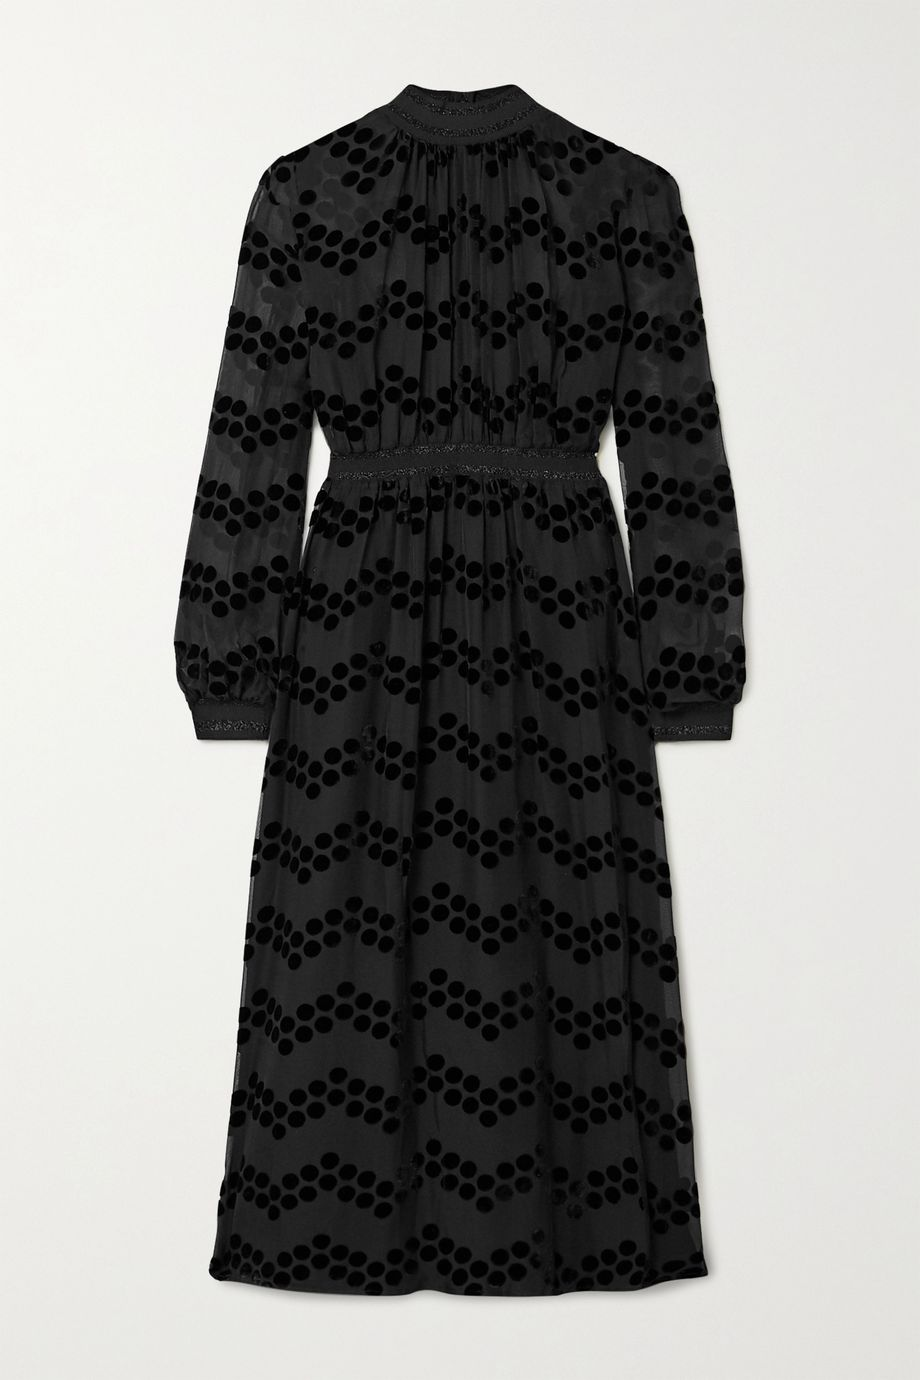 Tory Burch Polka-dot flocked chiffon midi dress